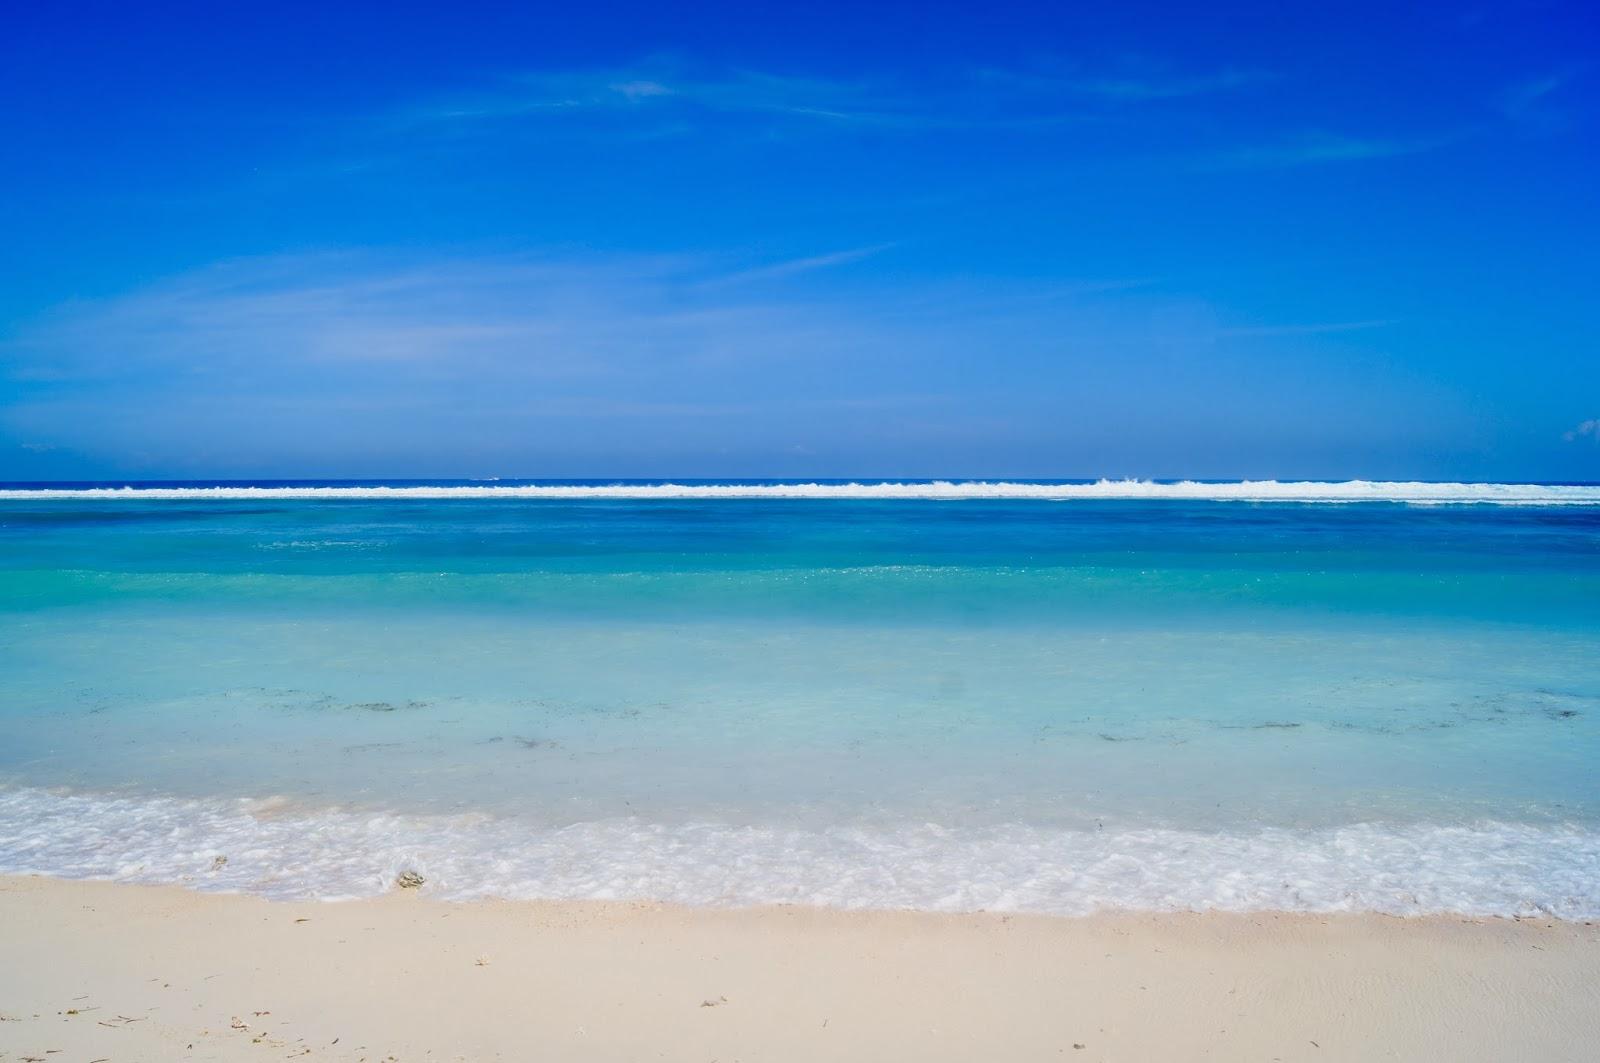 aguas turquesas de Gili Islands